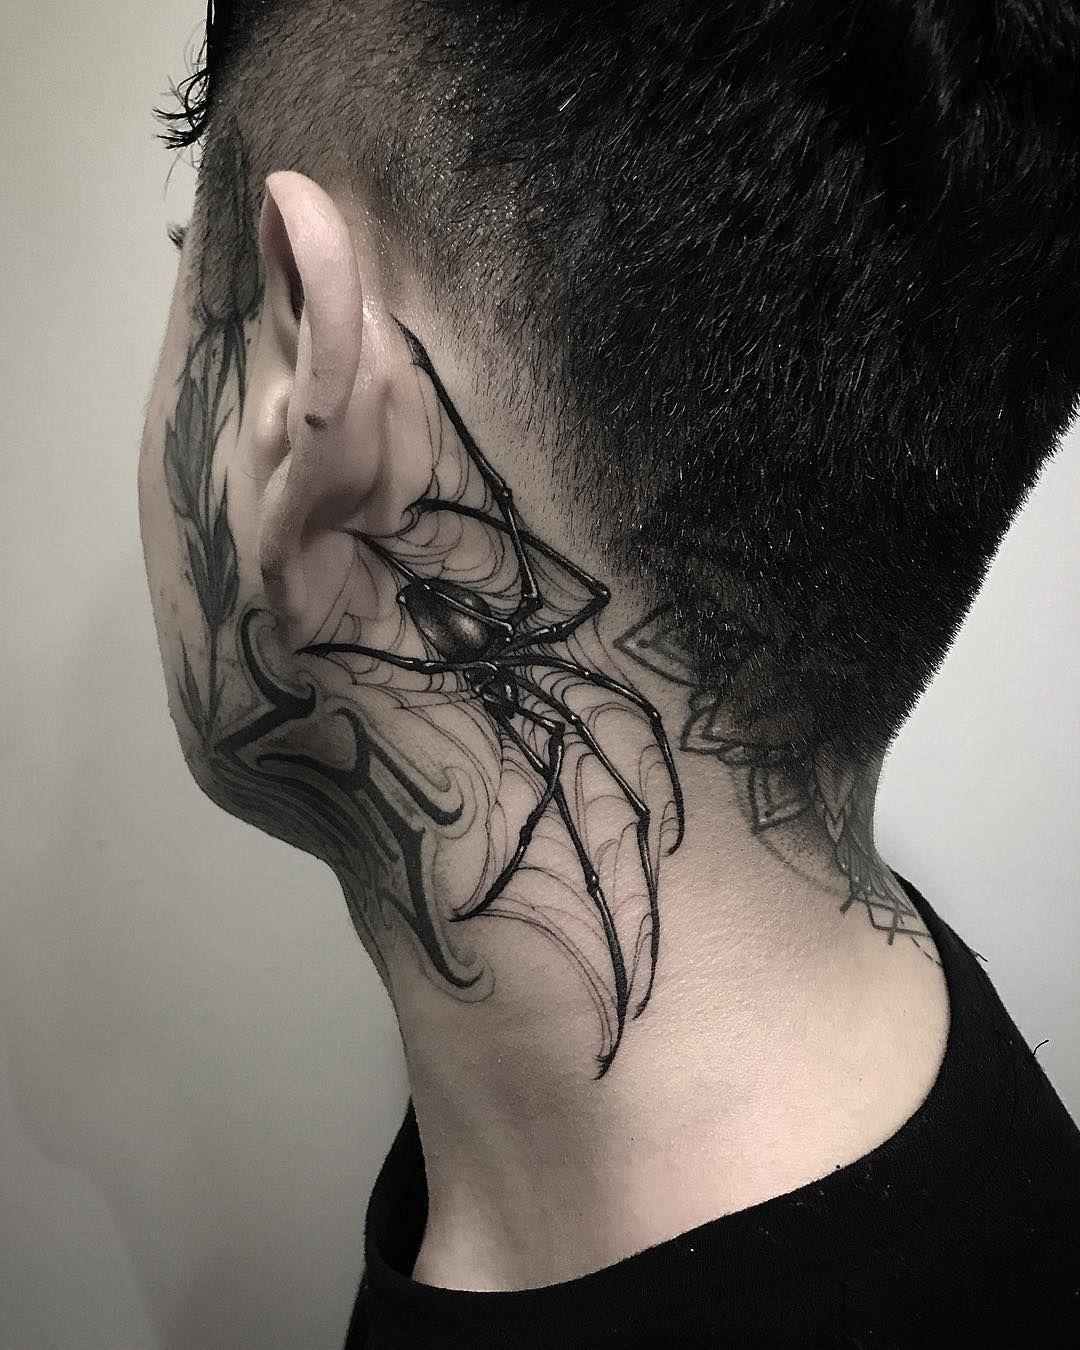 Blackwork By Gara Neck Tattoo Neck Tattoo For Guys Tattoo Artists